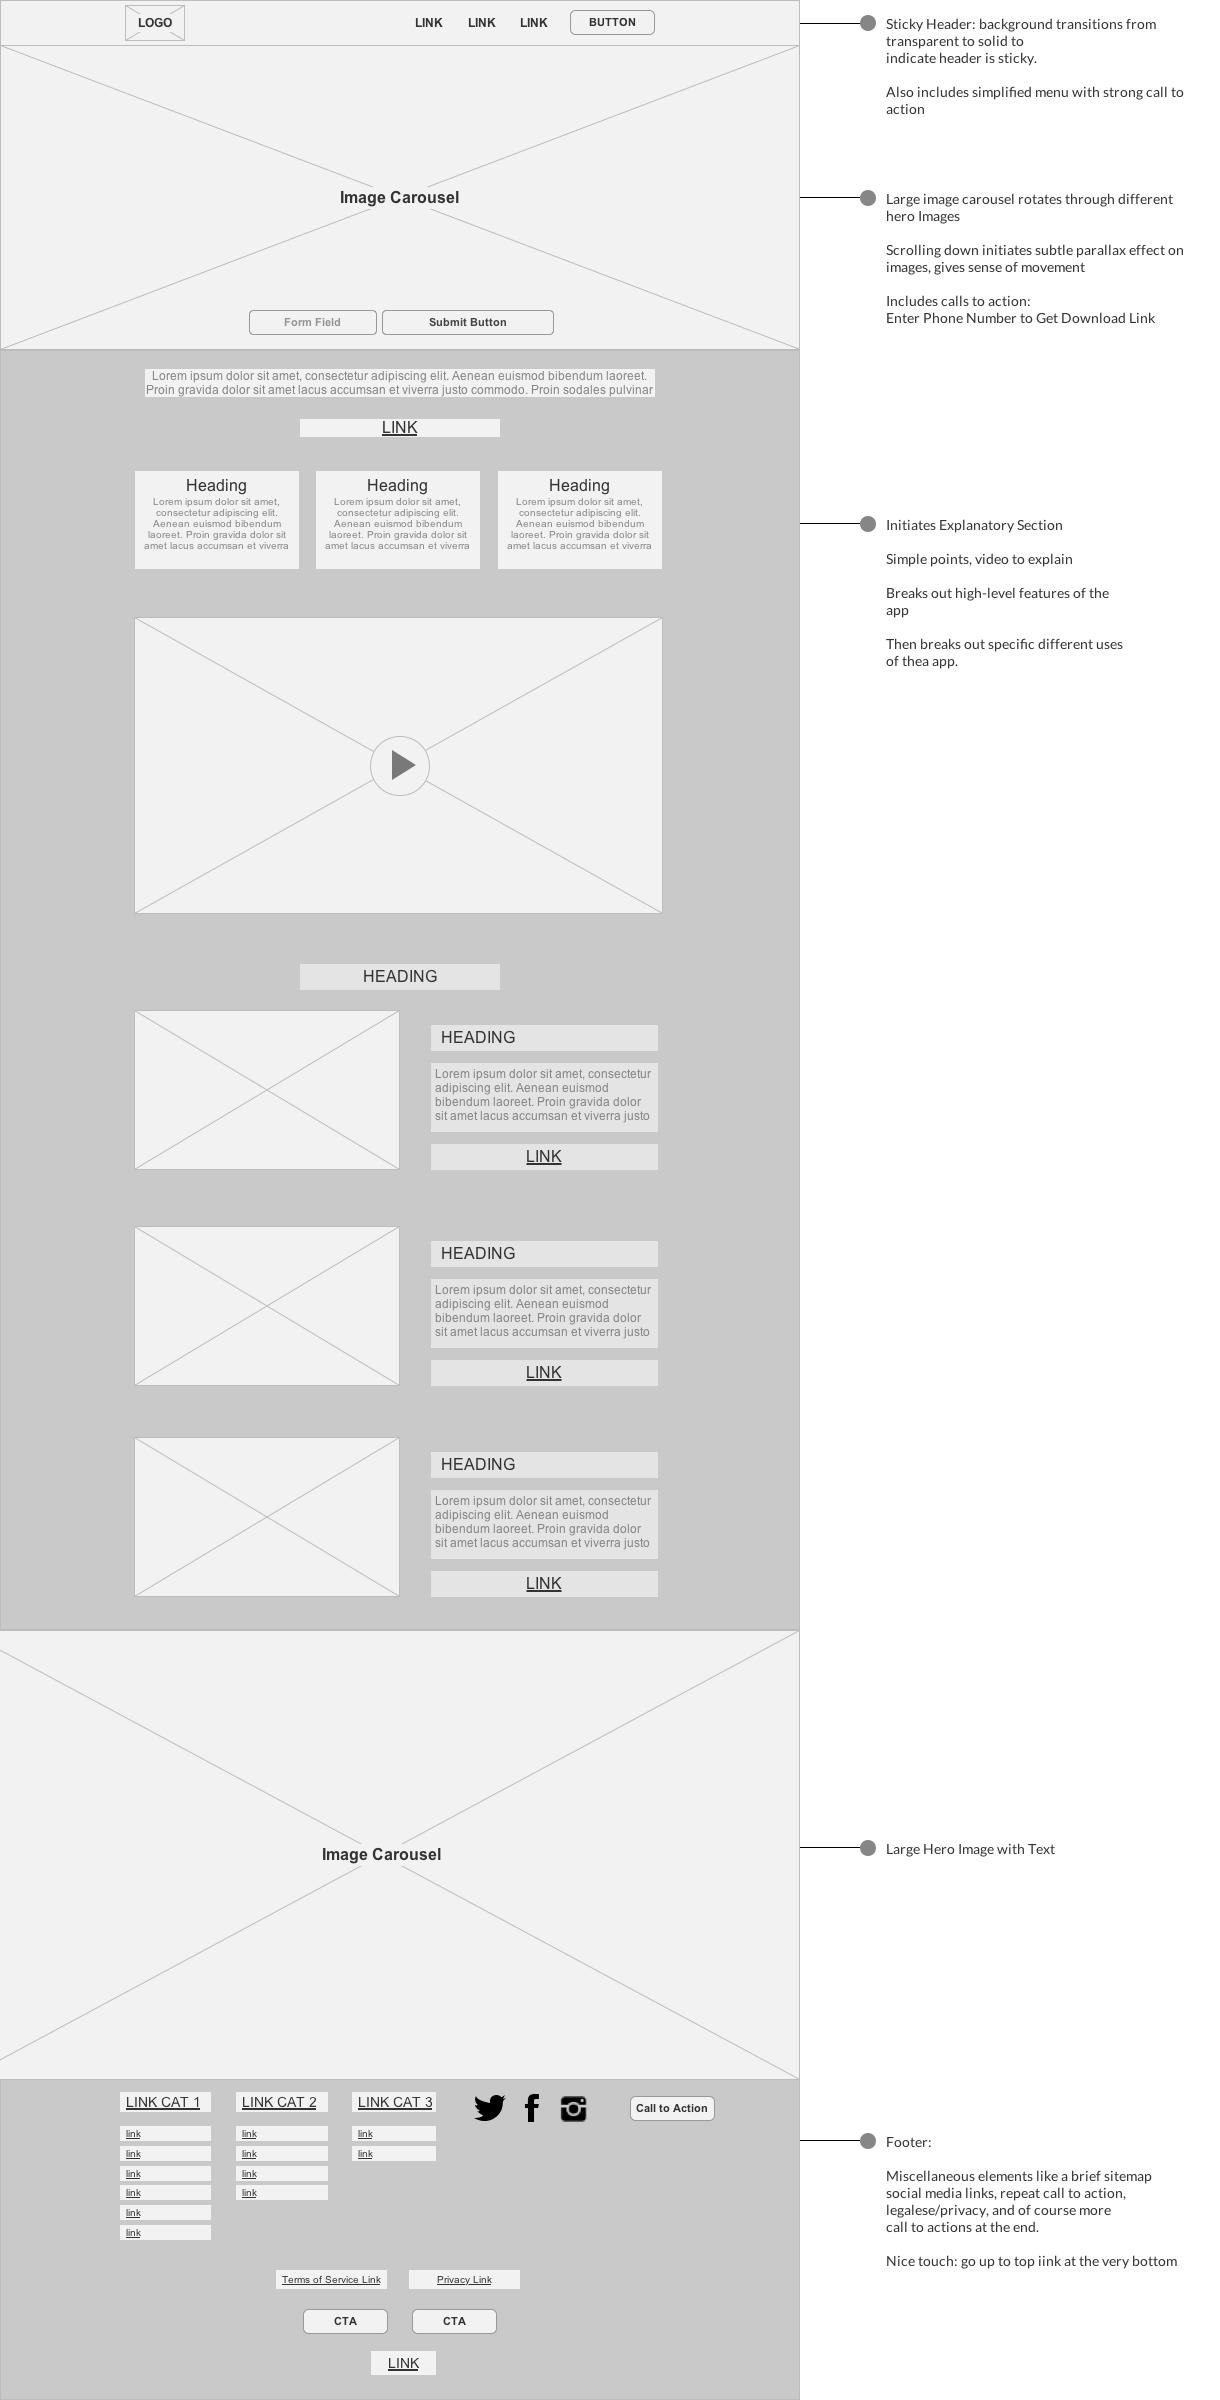 UXB-Copycat-Designer-Lyft-Wireframe